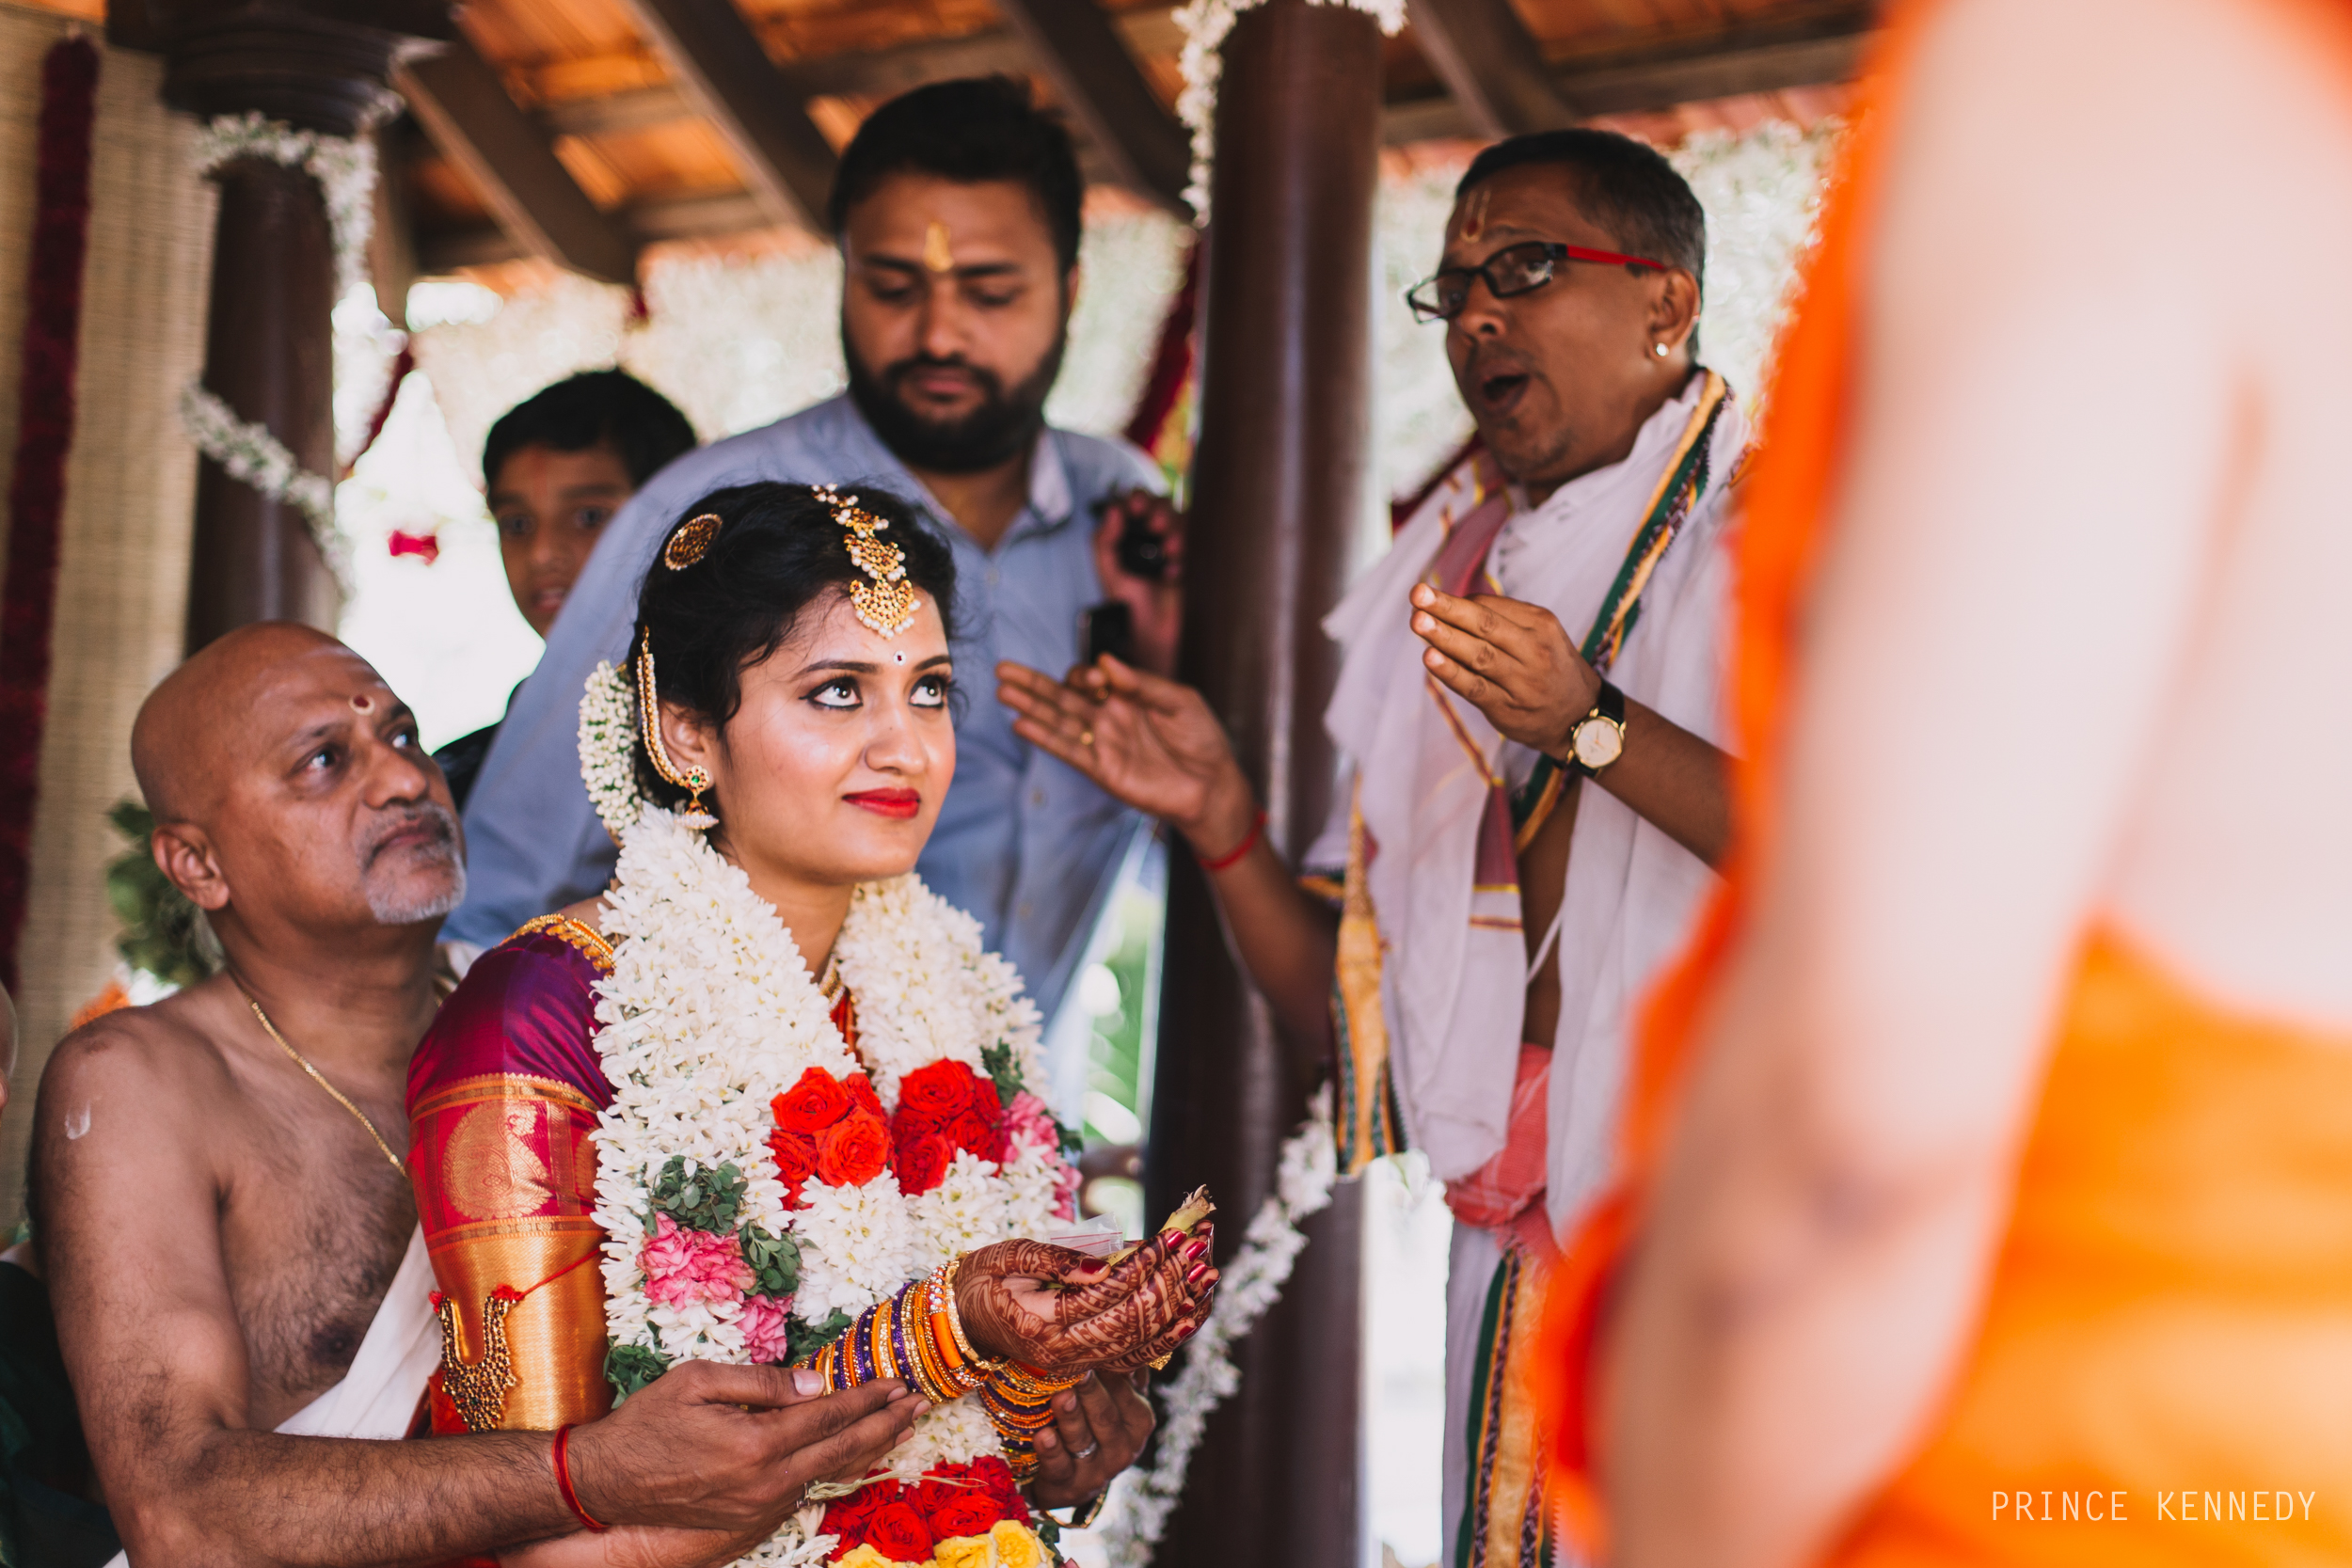 Athmajja-Nithesh-Engagement-Couple-Portrait-Portraiture-Wedding-Couple-Portrait-Chennai-Photographer-Candid-Photography-Destination-Best-Prince-Kennedy-Photography-228.jpg